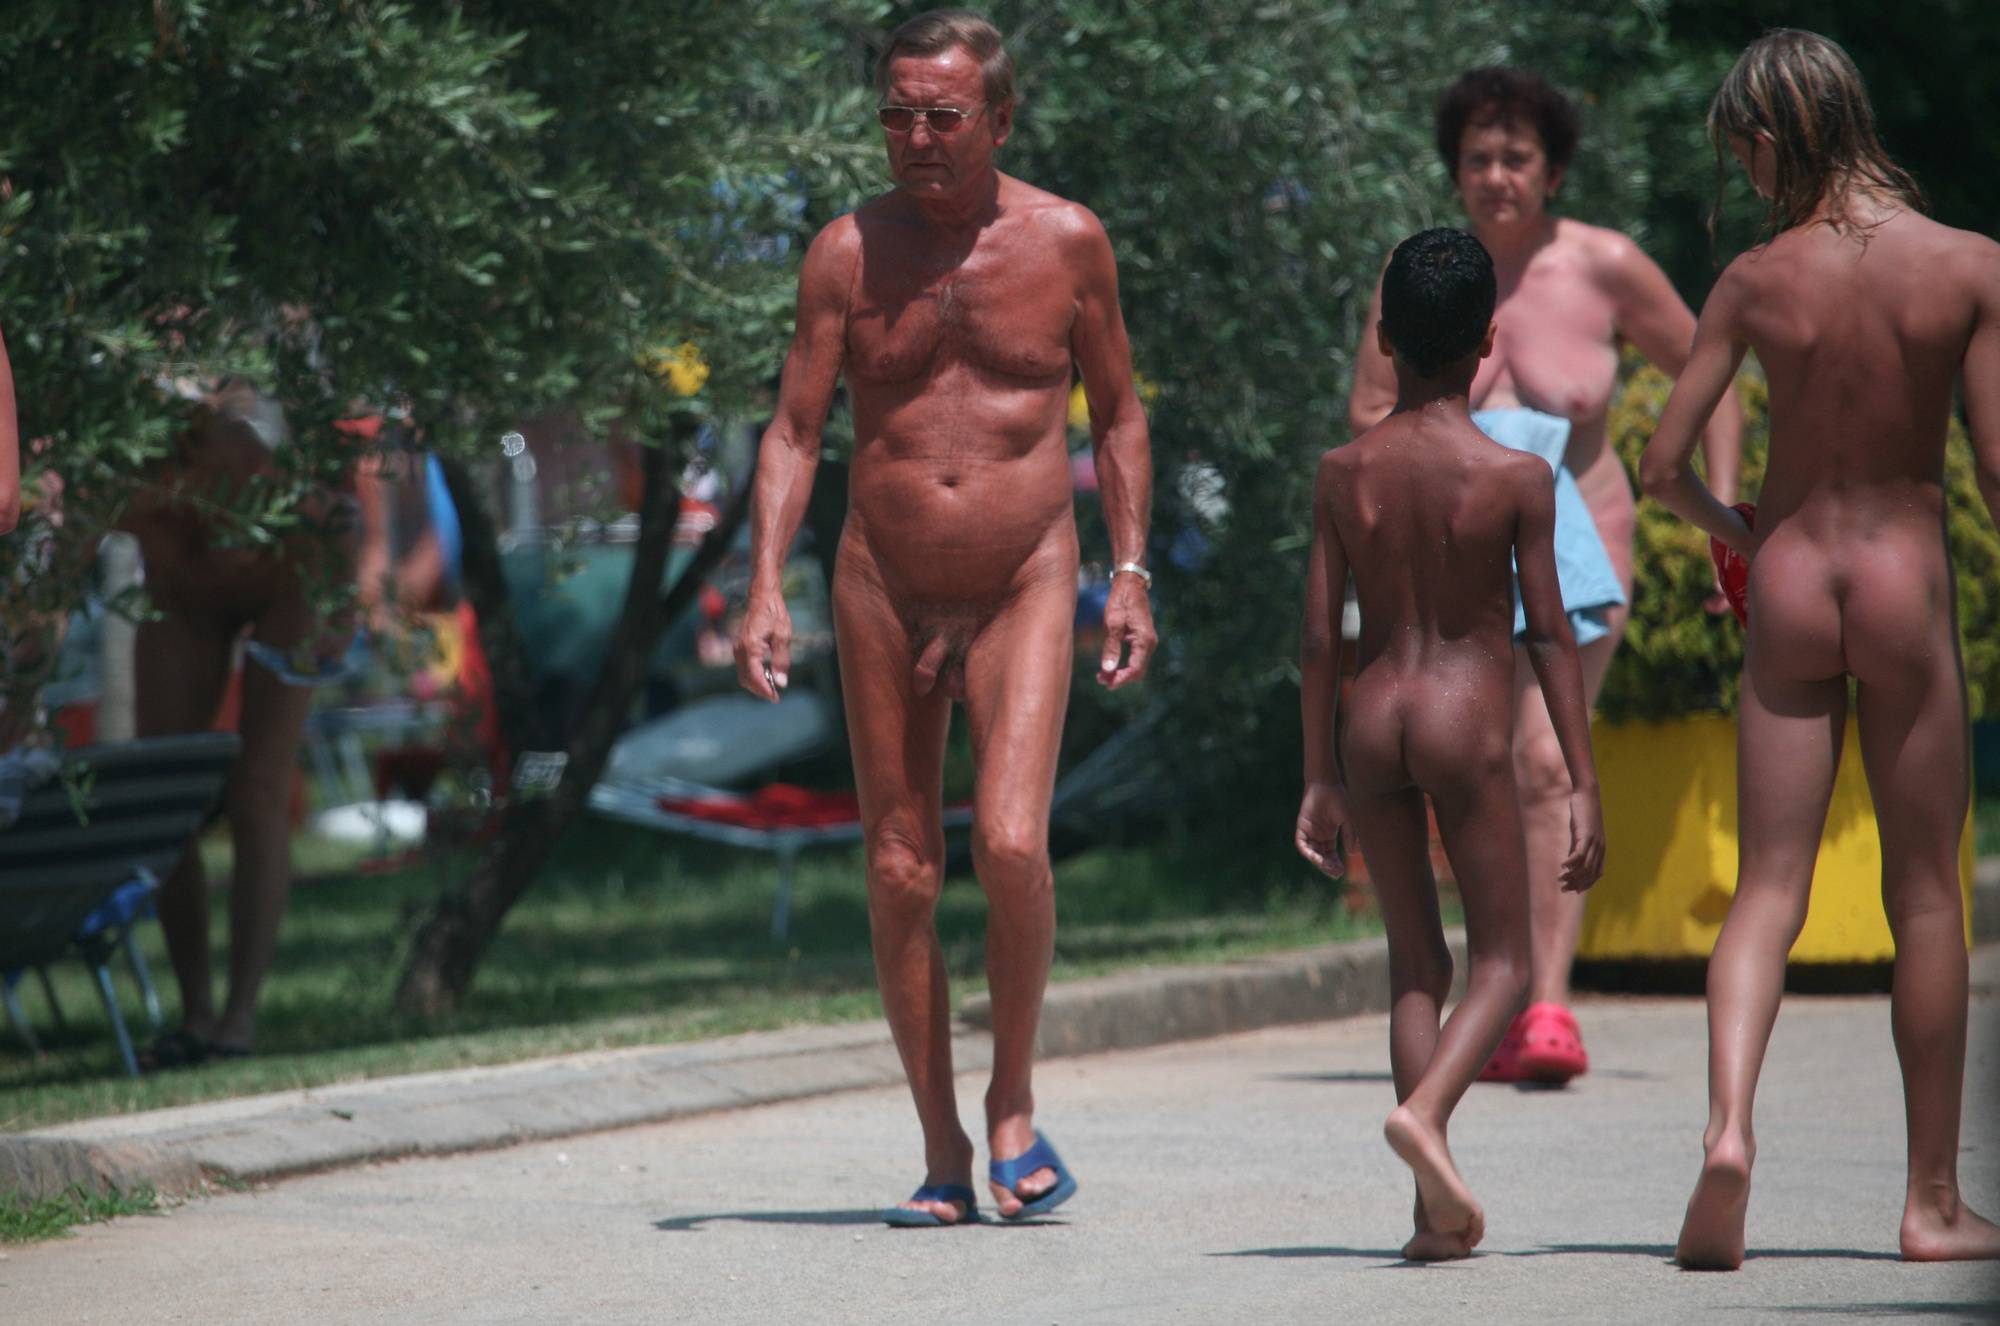 Nudist Gallery Nudist Dinner-Front Walks - 2